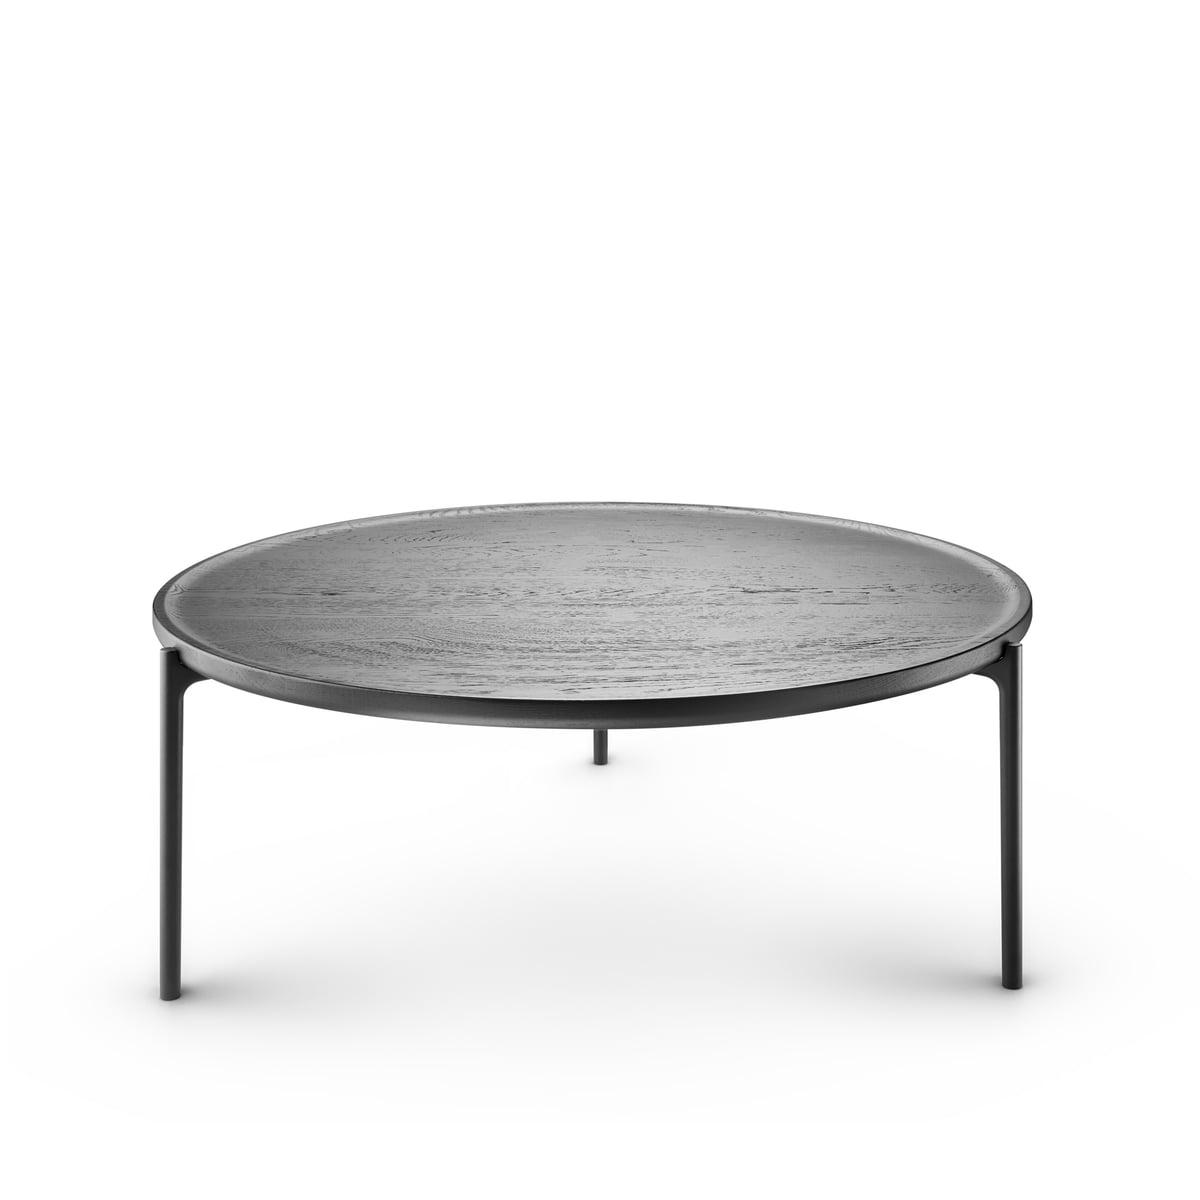 Eva Solo Savoye Coffee Table ø 60 Cm Oak Natural Black